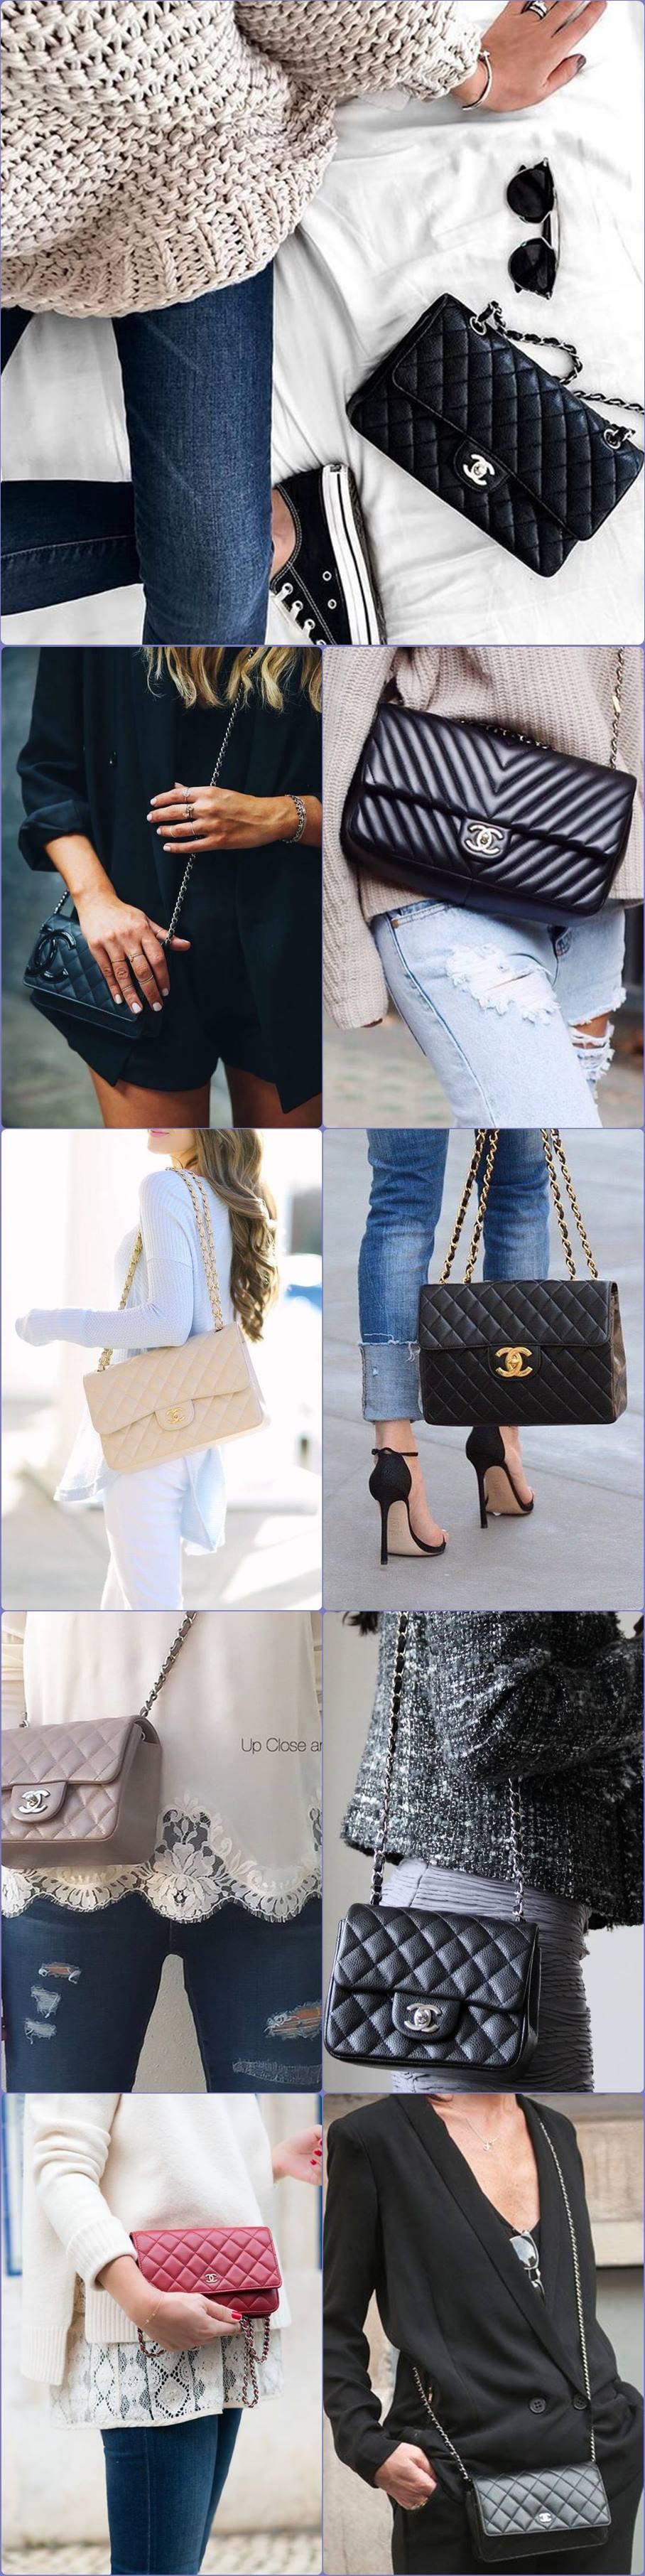 chanel bolsa pequena handbag